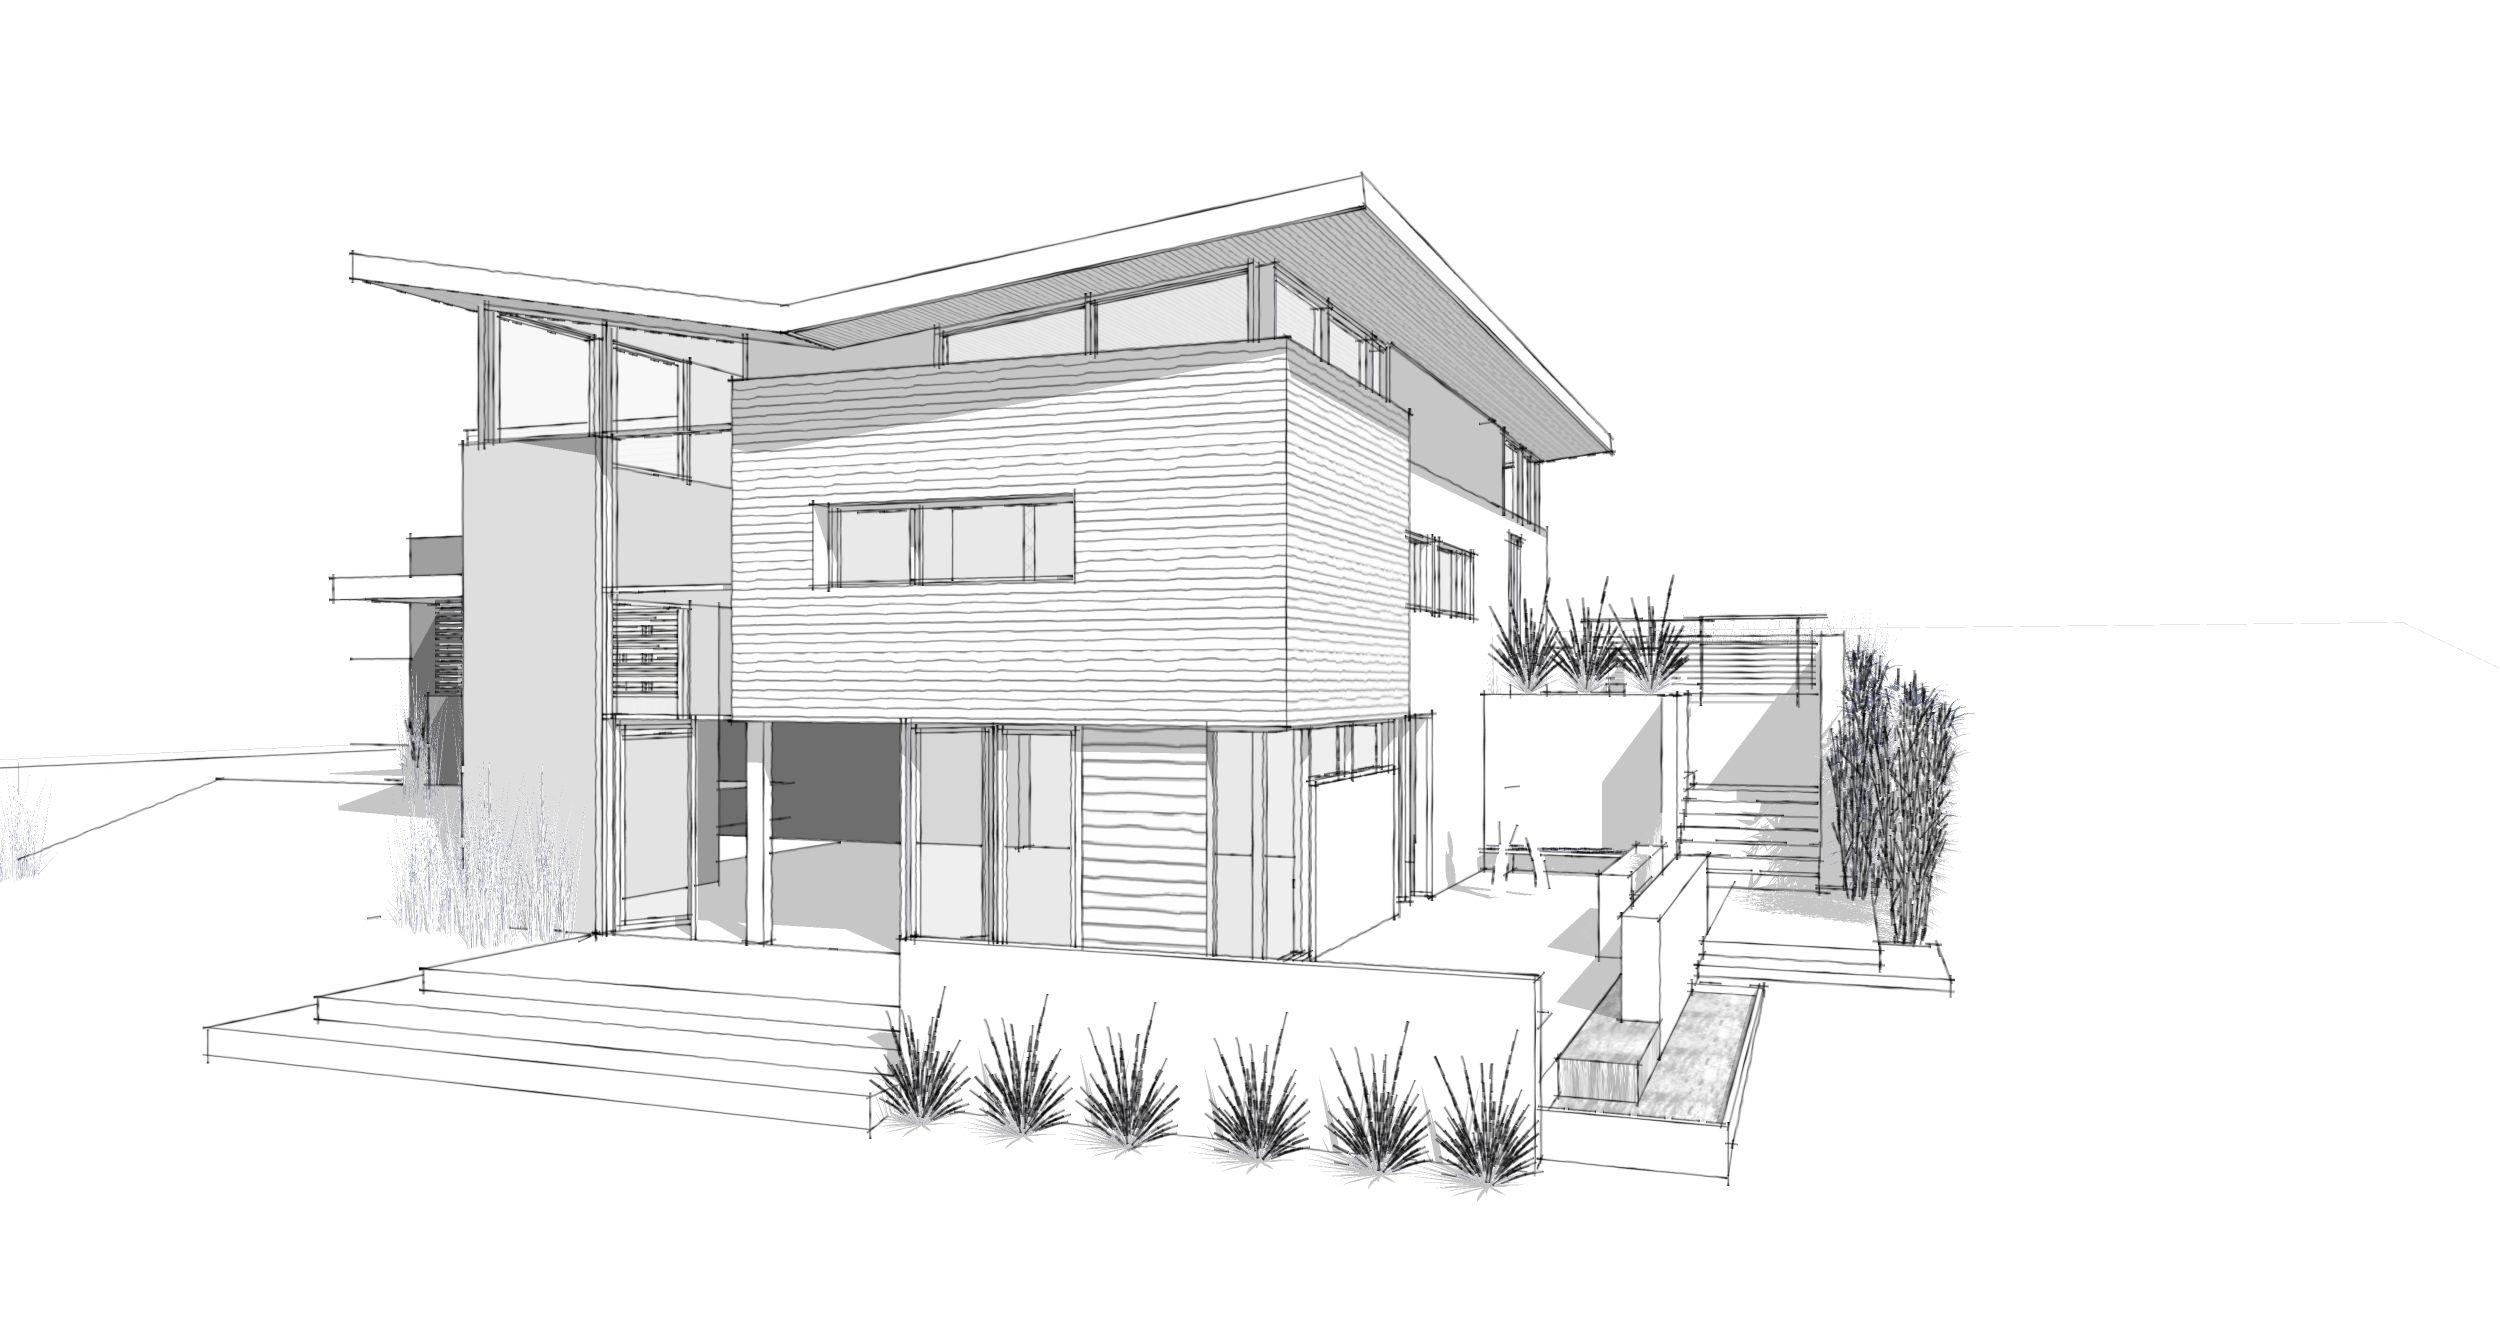 Modern Home Architecture Sketches Design Ideas 13435 Architecture